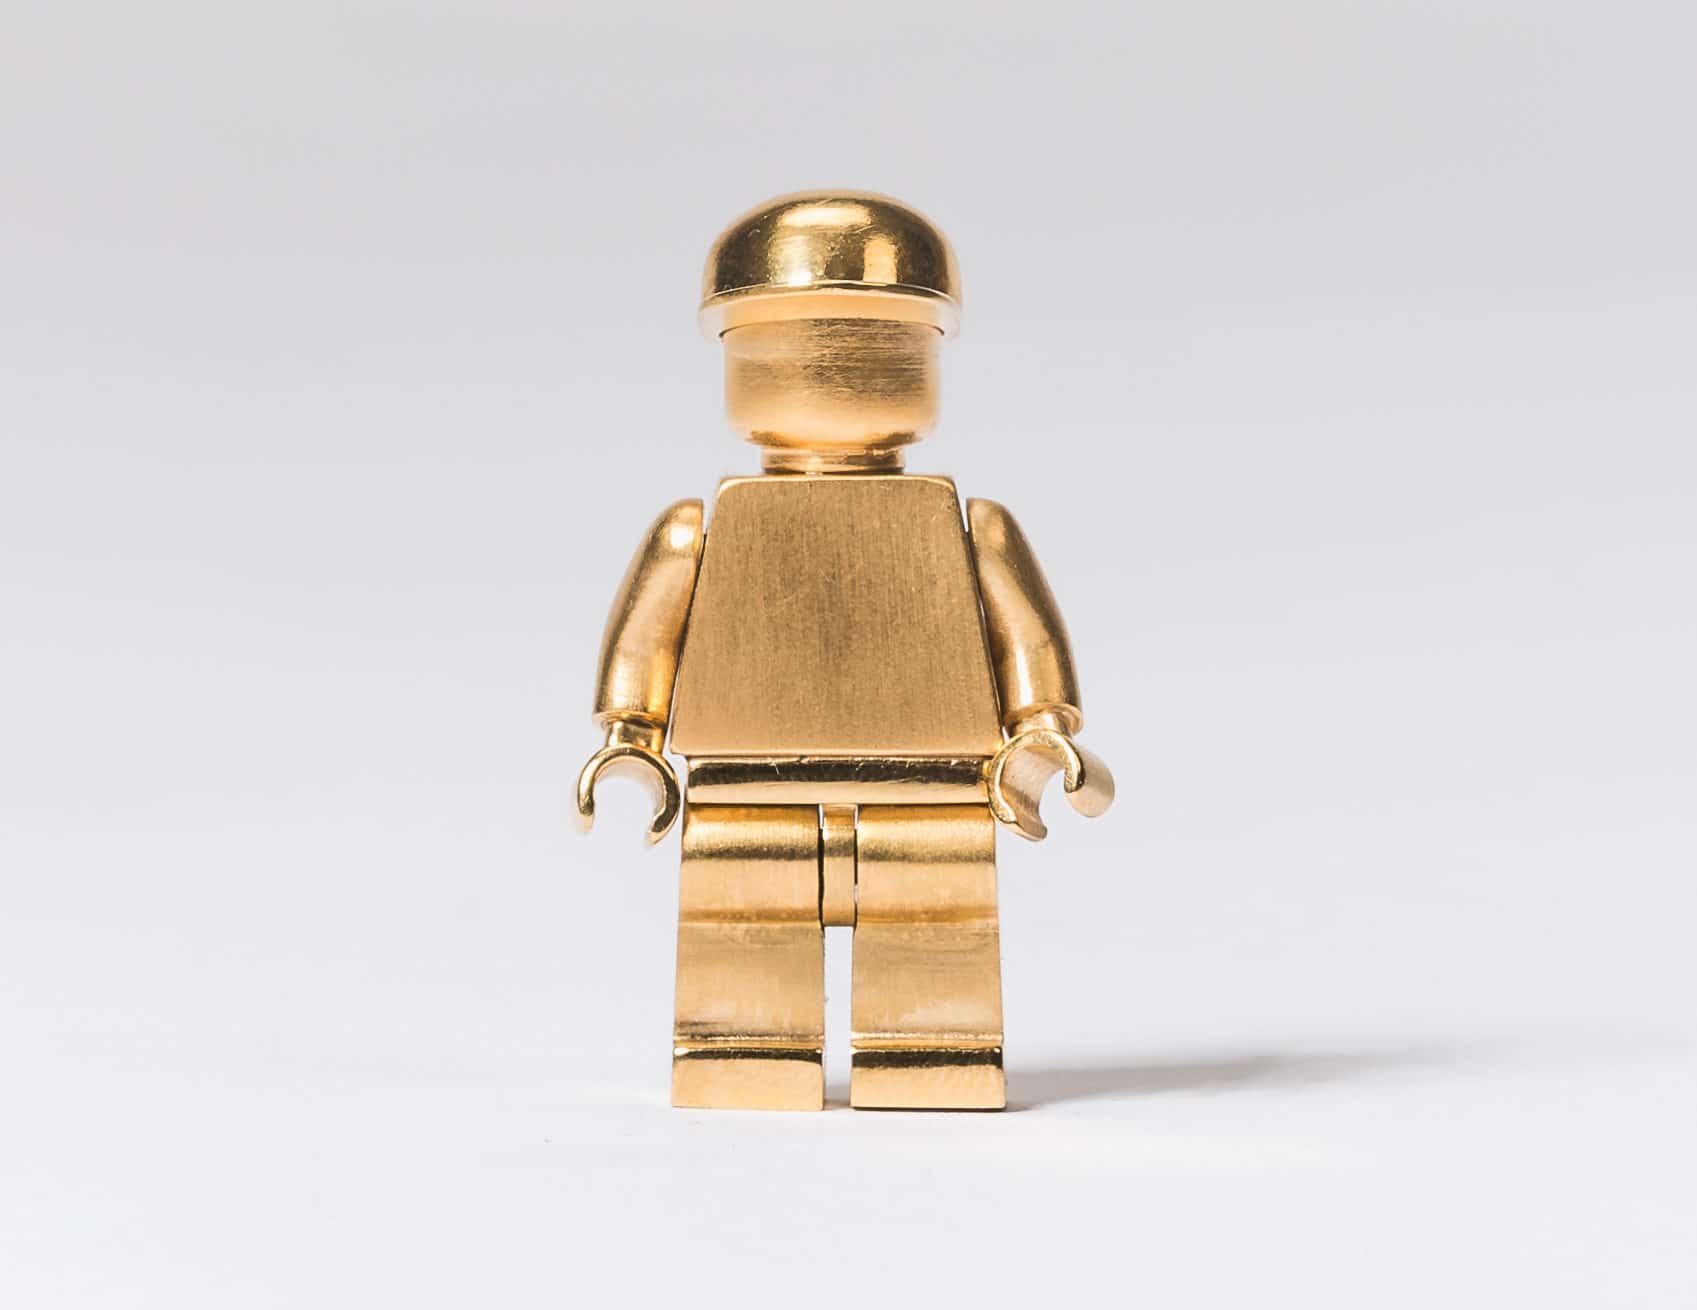 LEGO X Adidas X 43einhalb X Overkill 14